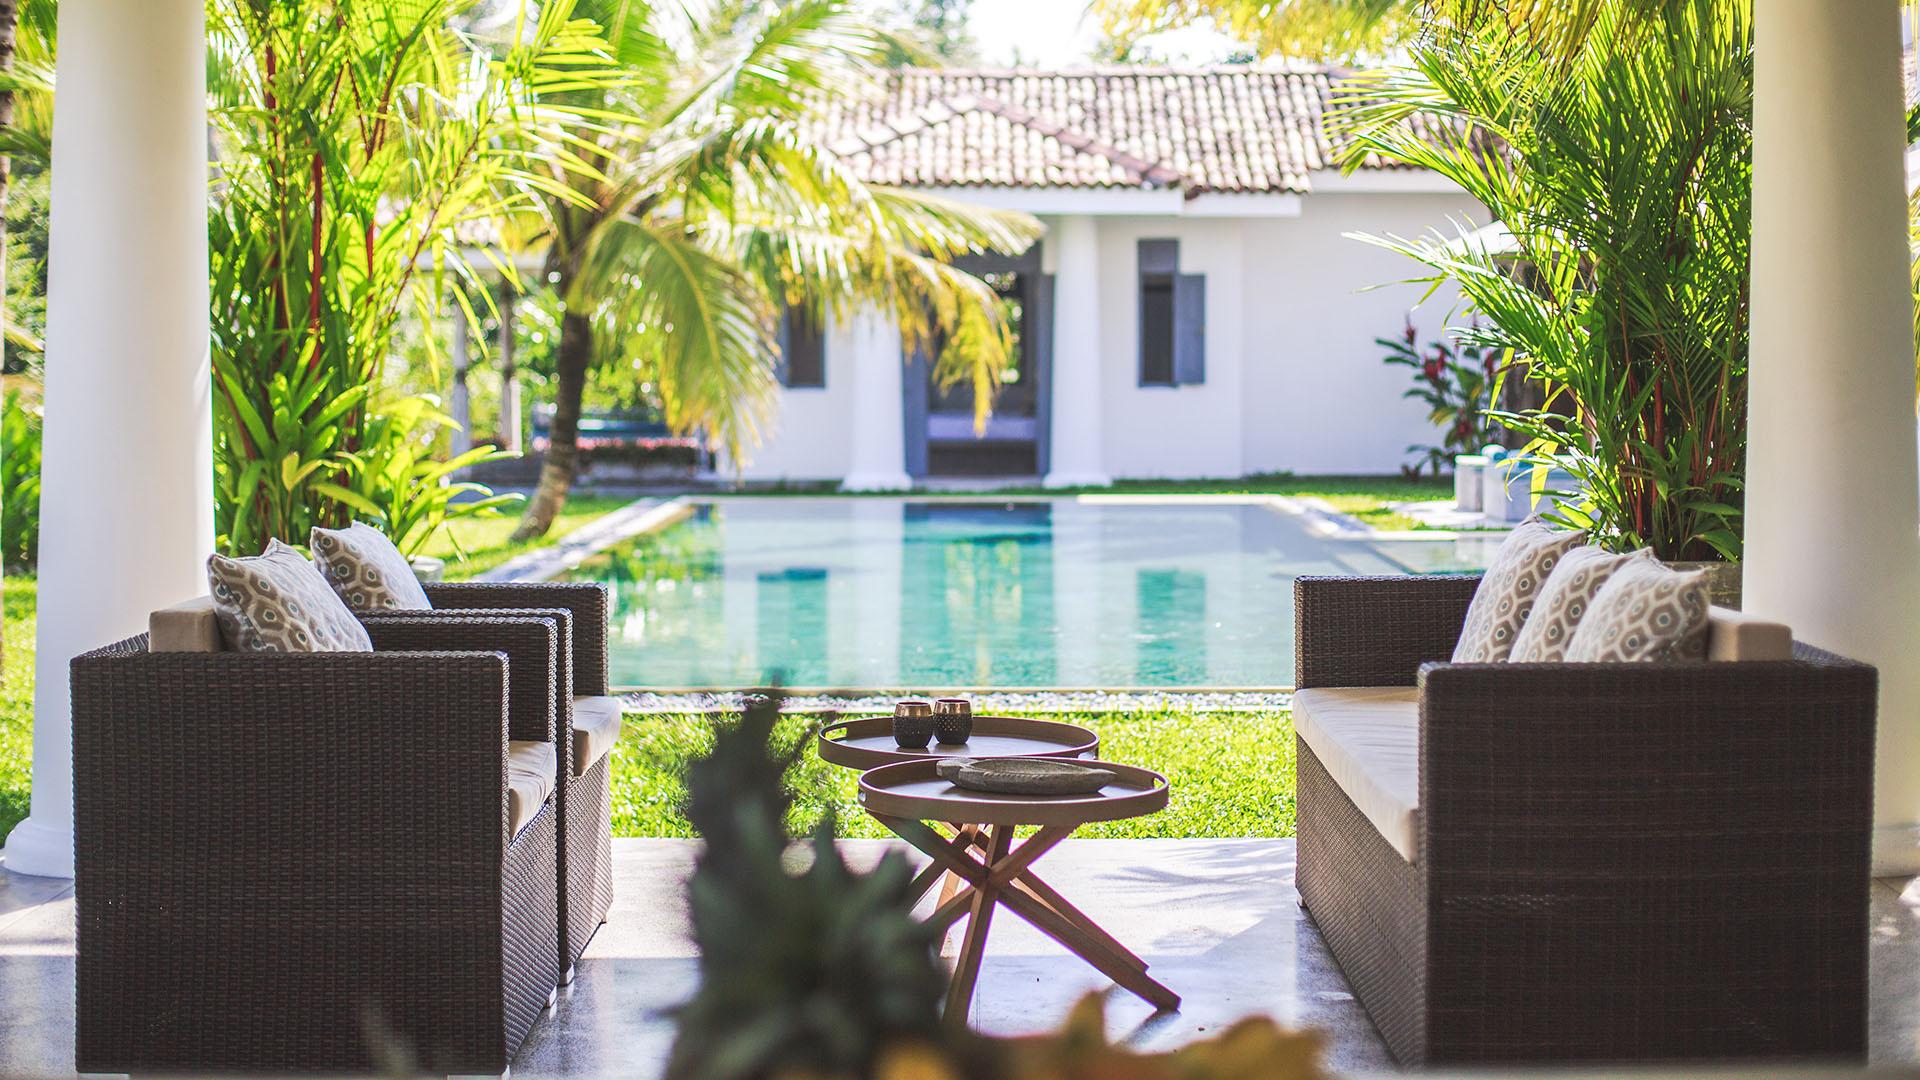 Sri_lanka_holiday_villa_sissila_general_Sri_lanka_holiday_villa_sissila_general_02.jpg